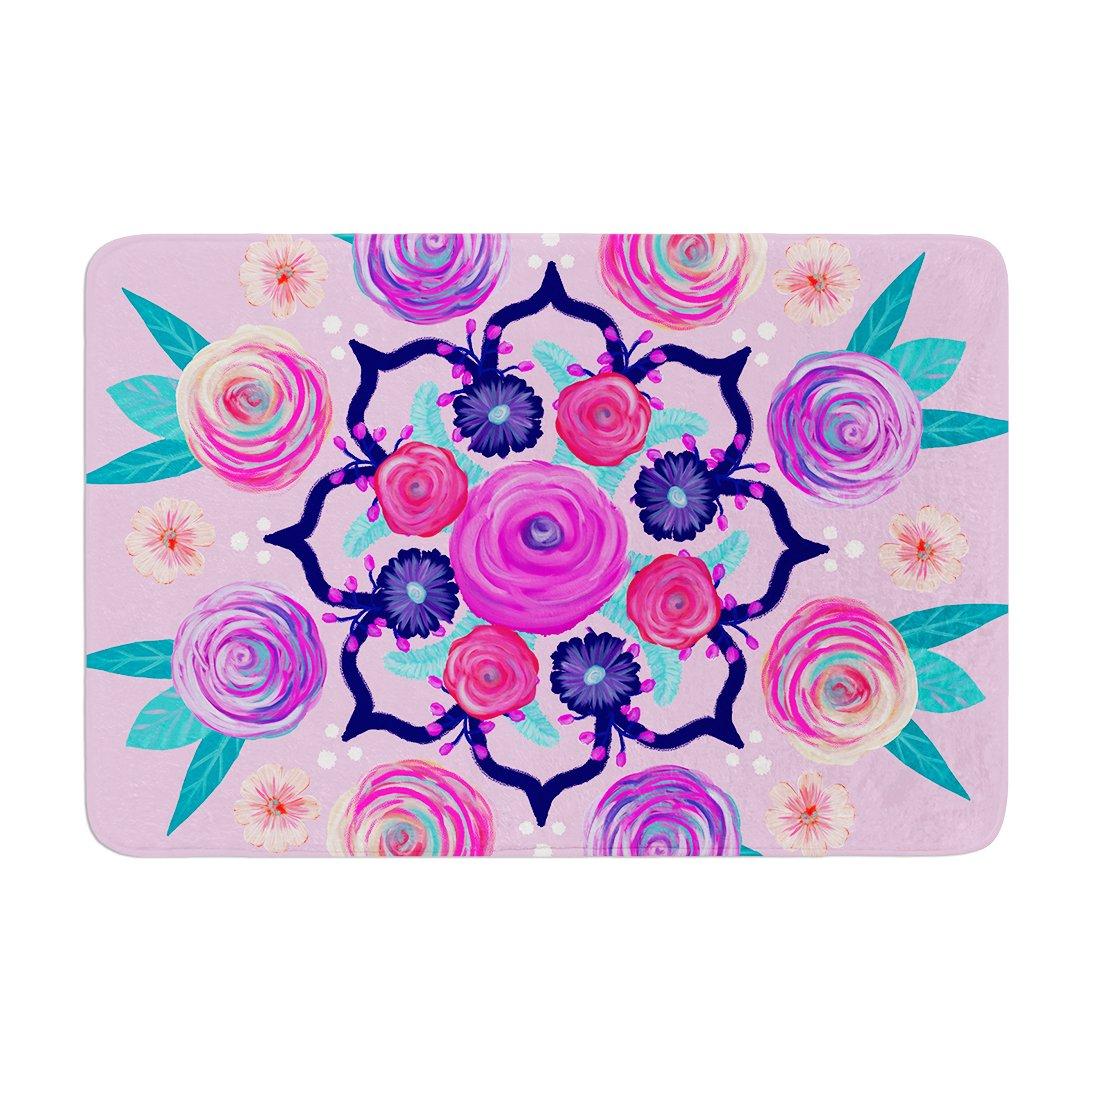 17 by 24 Kess InHouse Anneline Sophia Expressive Blooms Mandala Pink Floral Memory Foam/Bath Mat